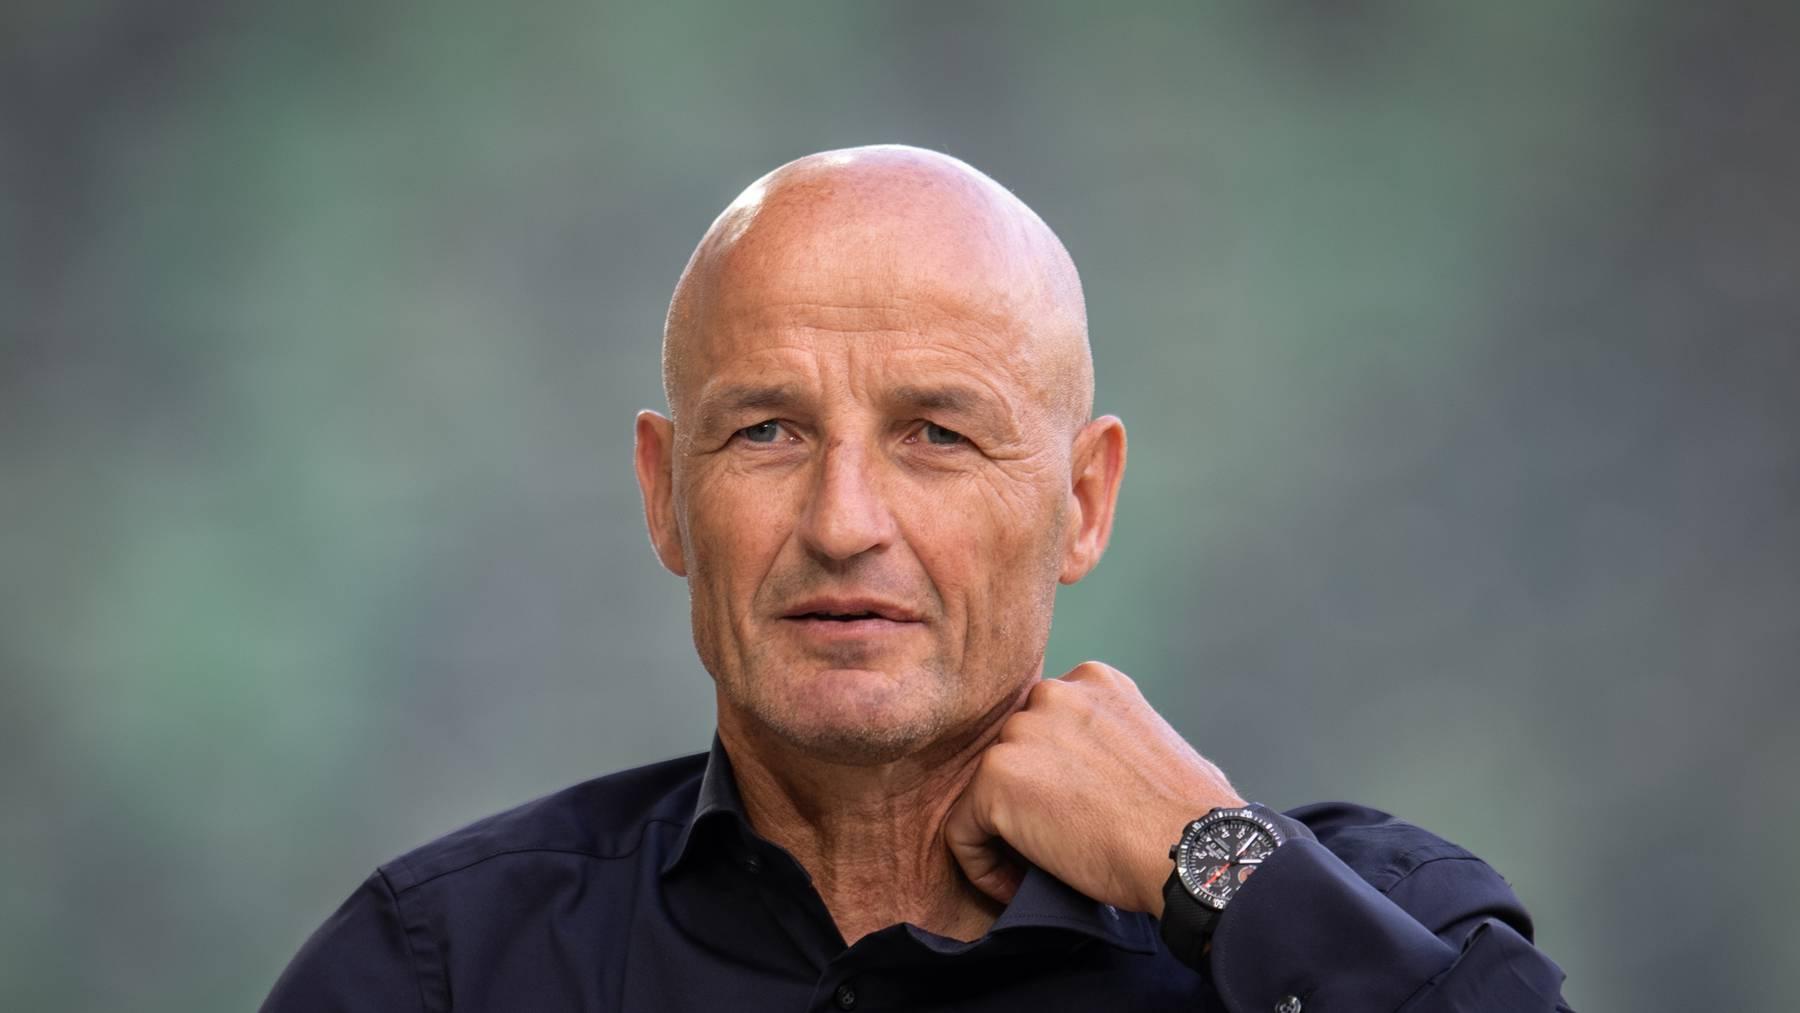 Wen wird Peter Zeidler gegen Leverkusen spielen lassen?